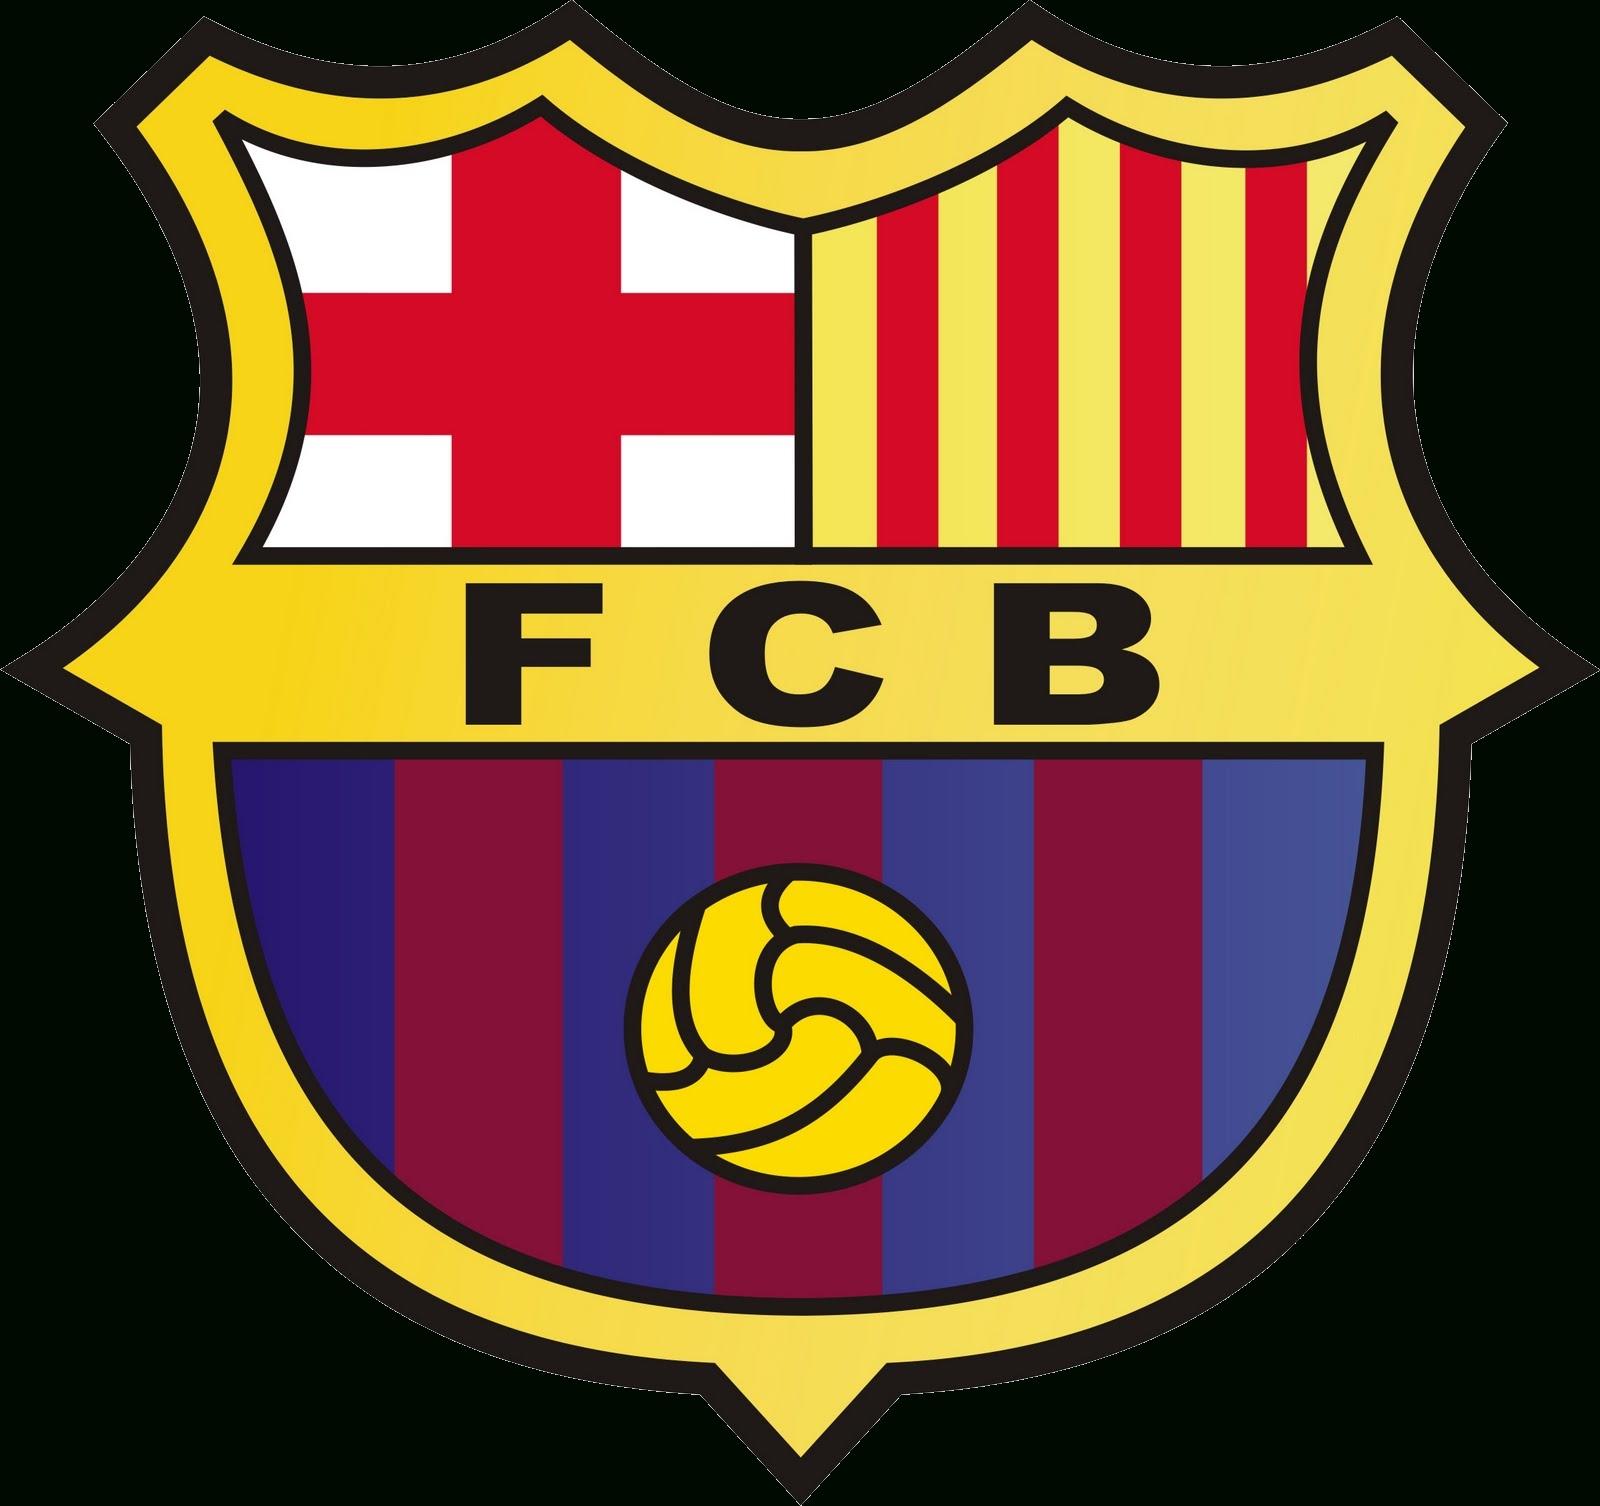 fc barcelona png logo, fcb png logo free download